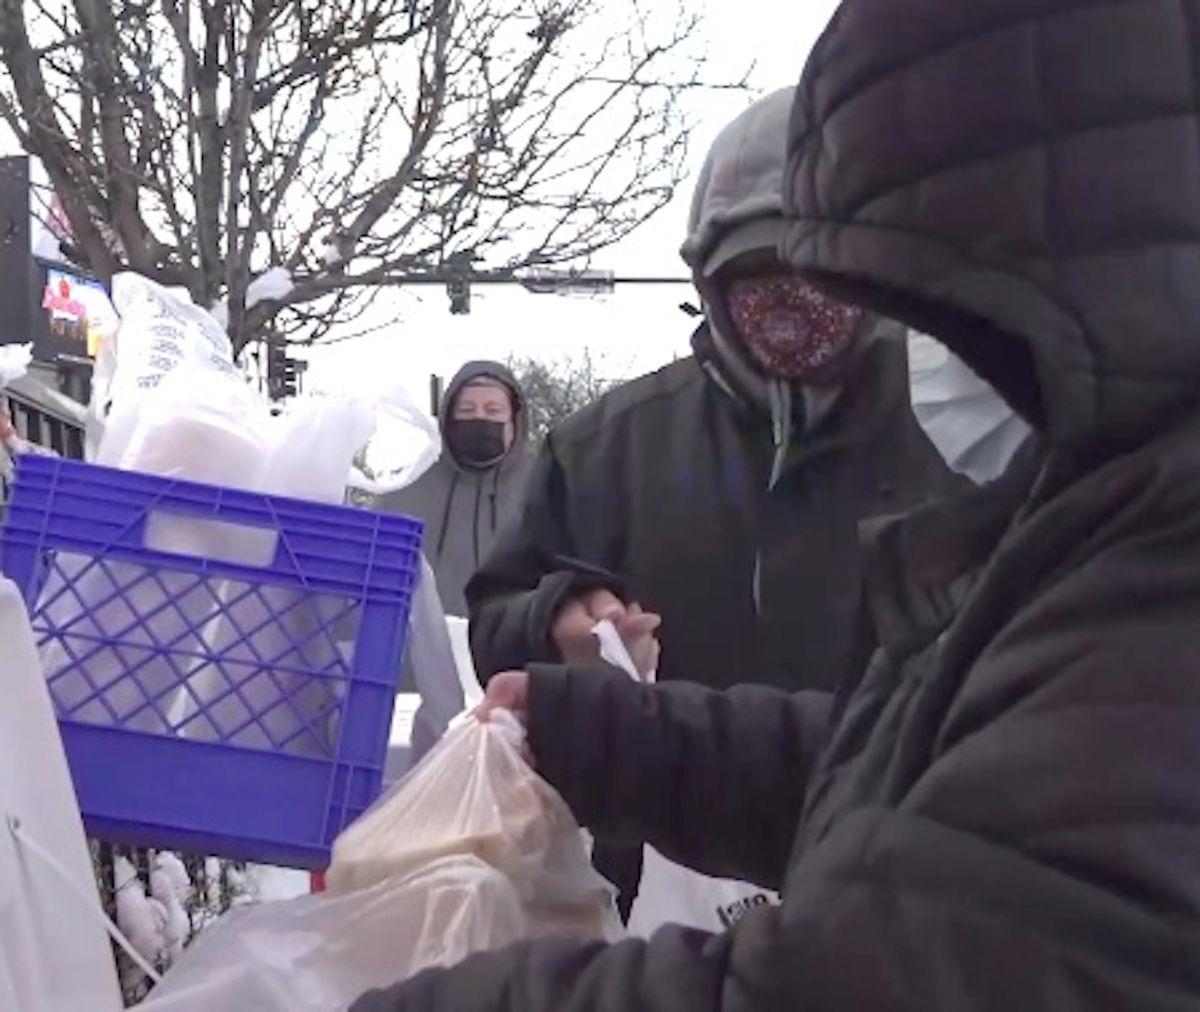 Restaurantero de Chicago compra tamales a vendedores locales para ayudar a alimentar a desamparados